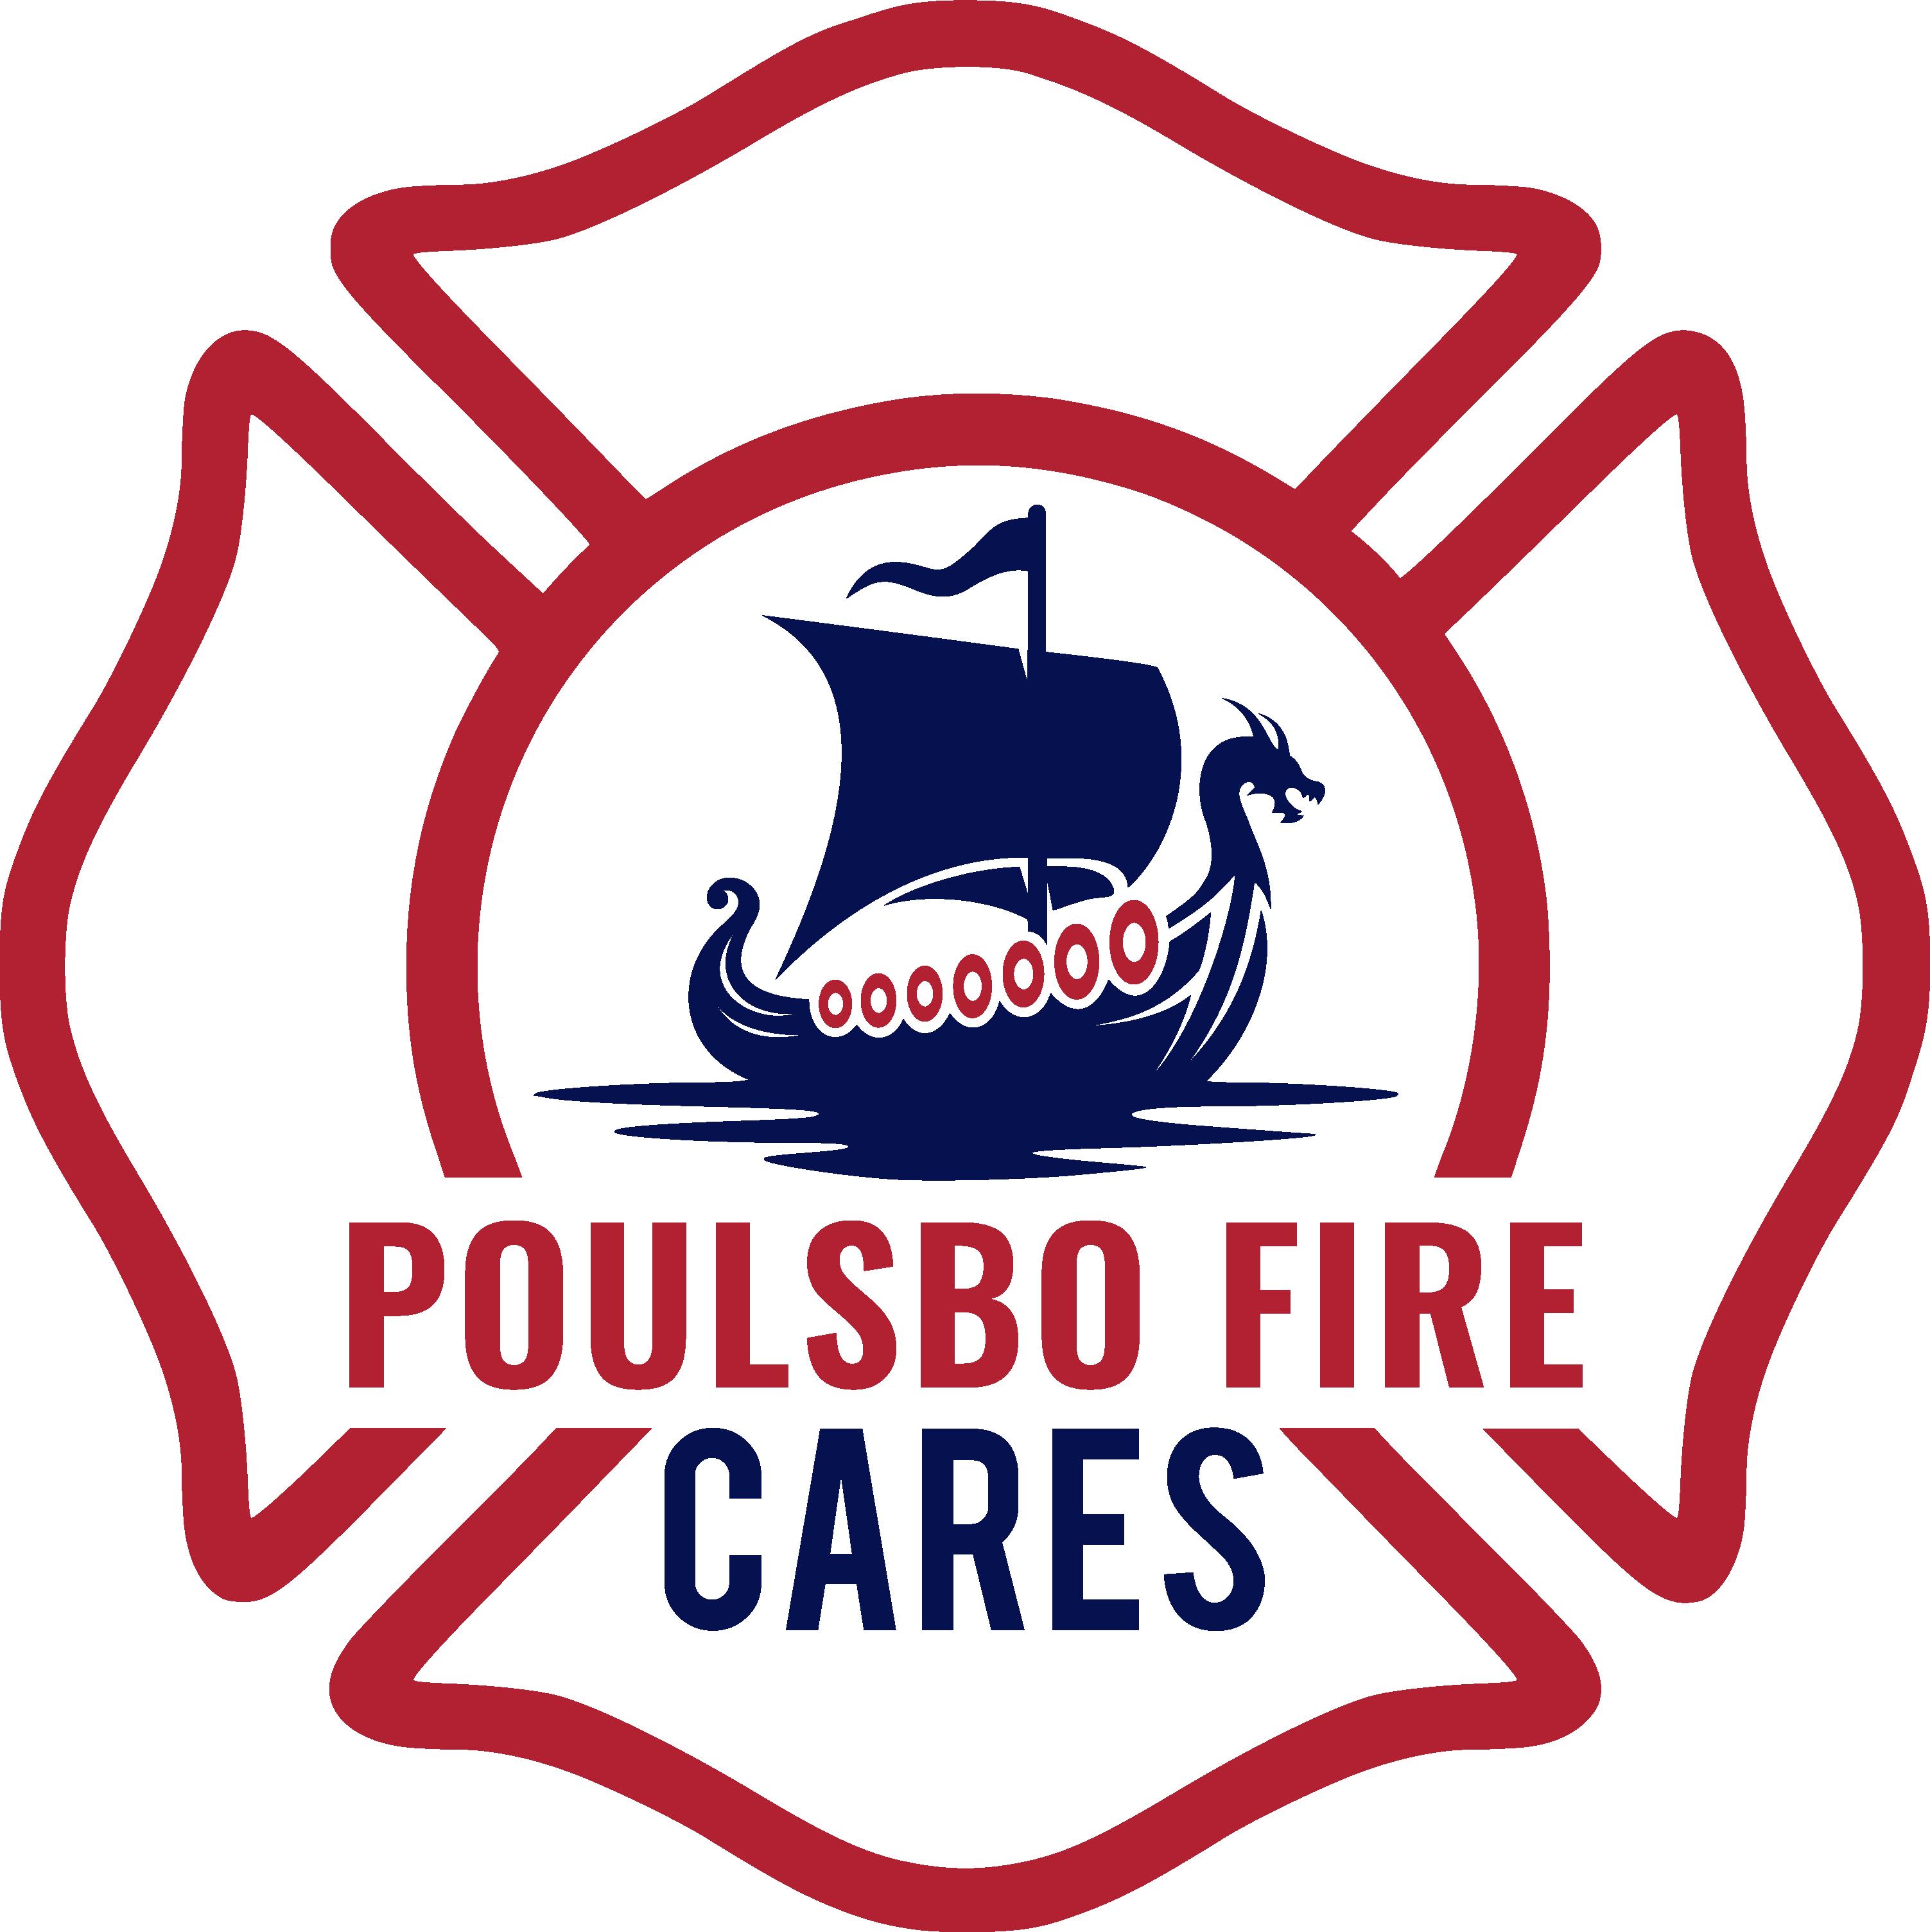 poulsbo fire cares logo